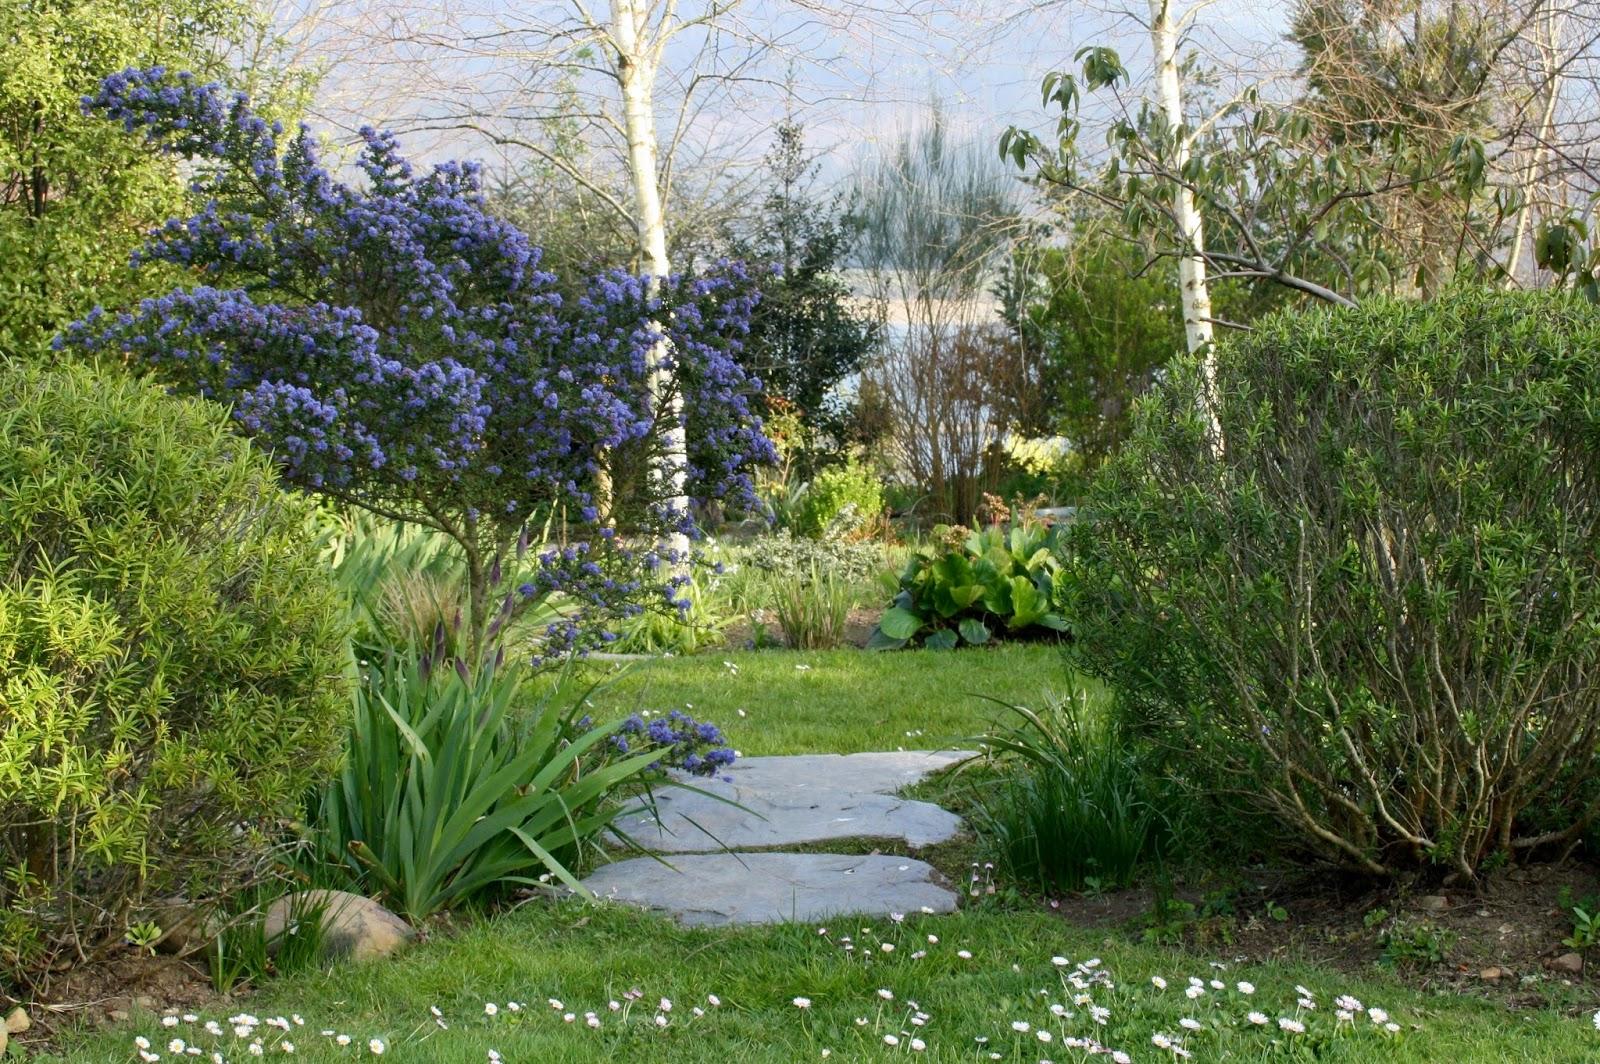 El jard n de margarita ceanothus de floraci n temprana for Jardin azul canal 9